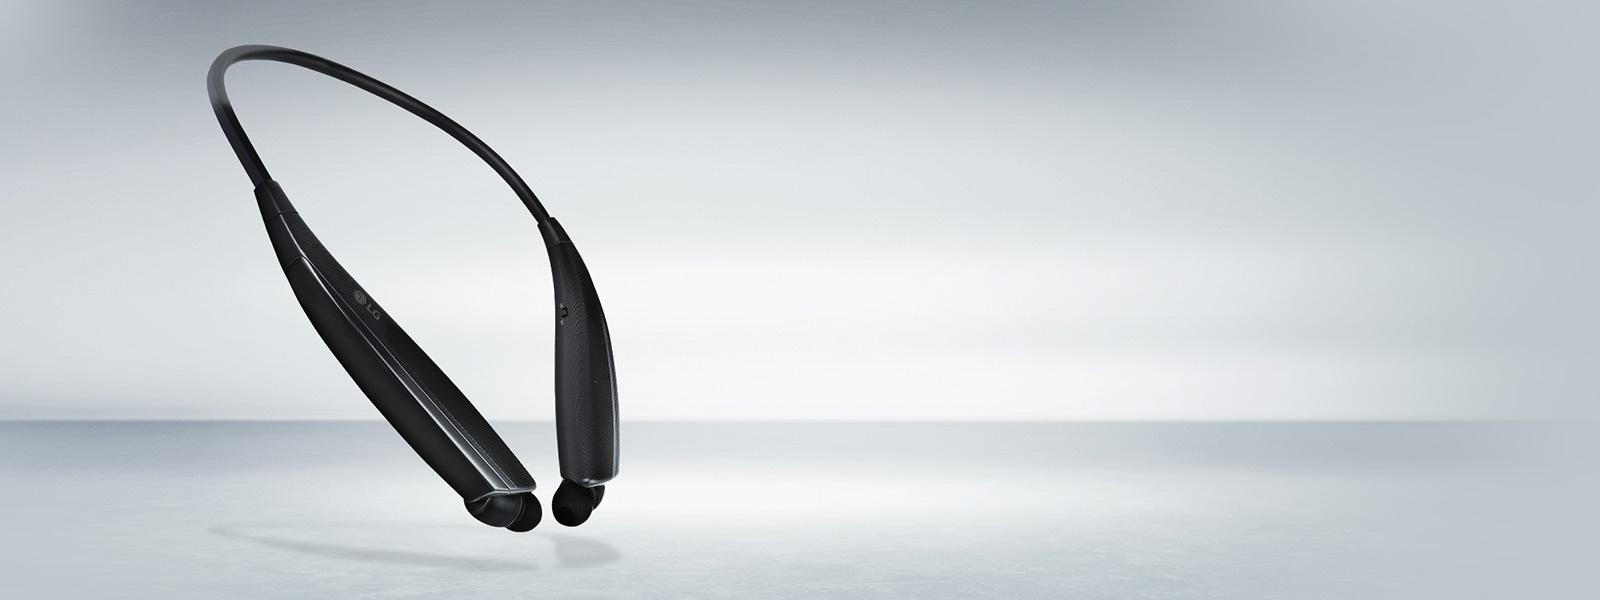 40644bfaa85 LG Bluetooth Headphones & Wireless Headsets   LG USA